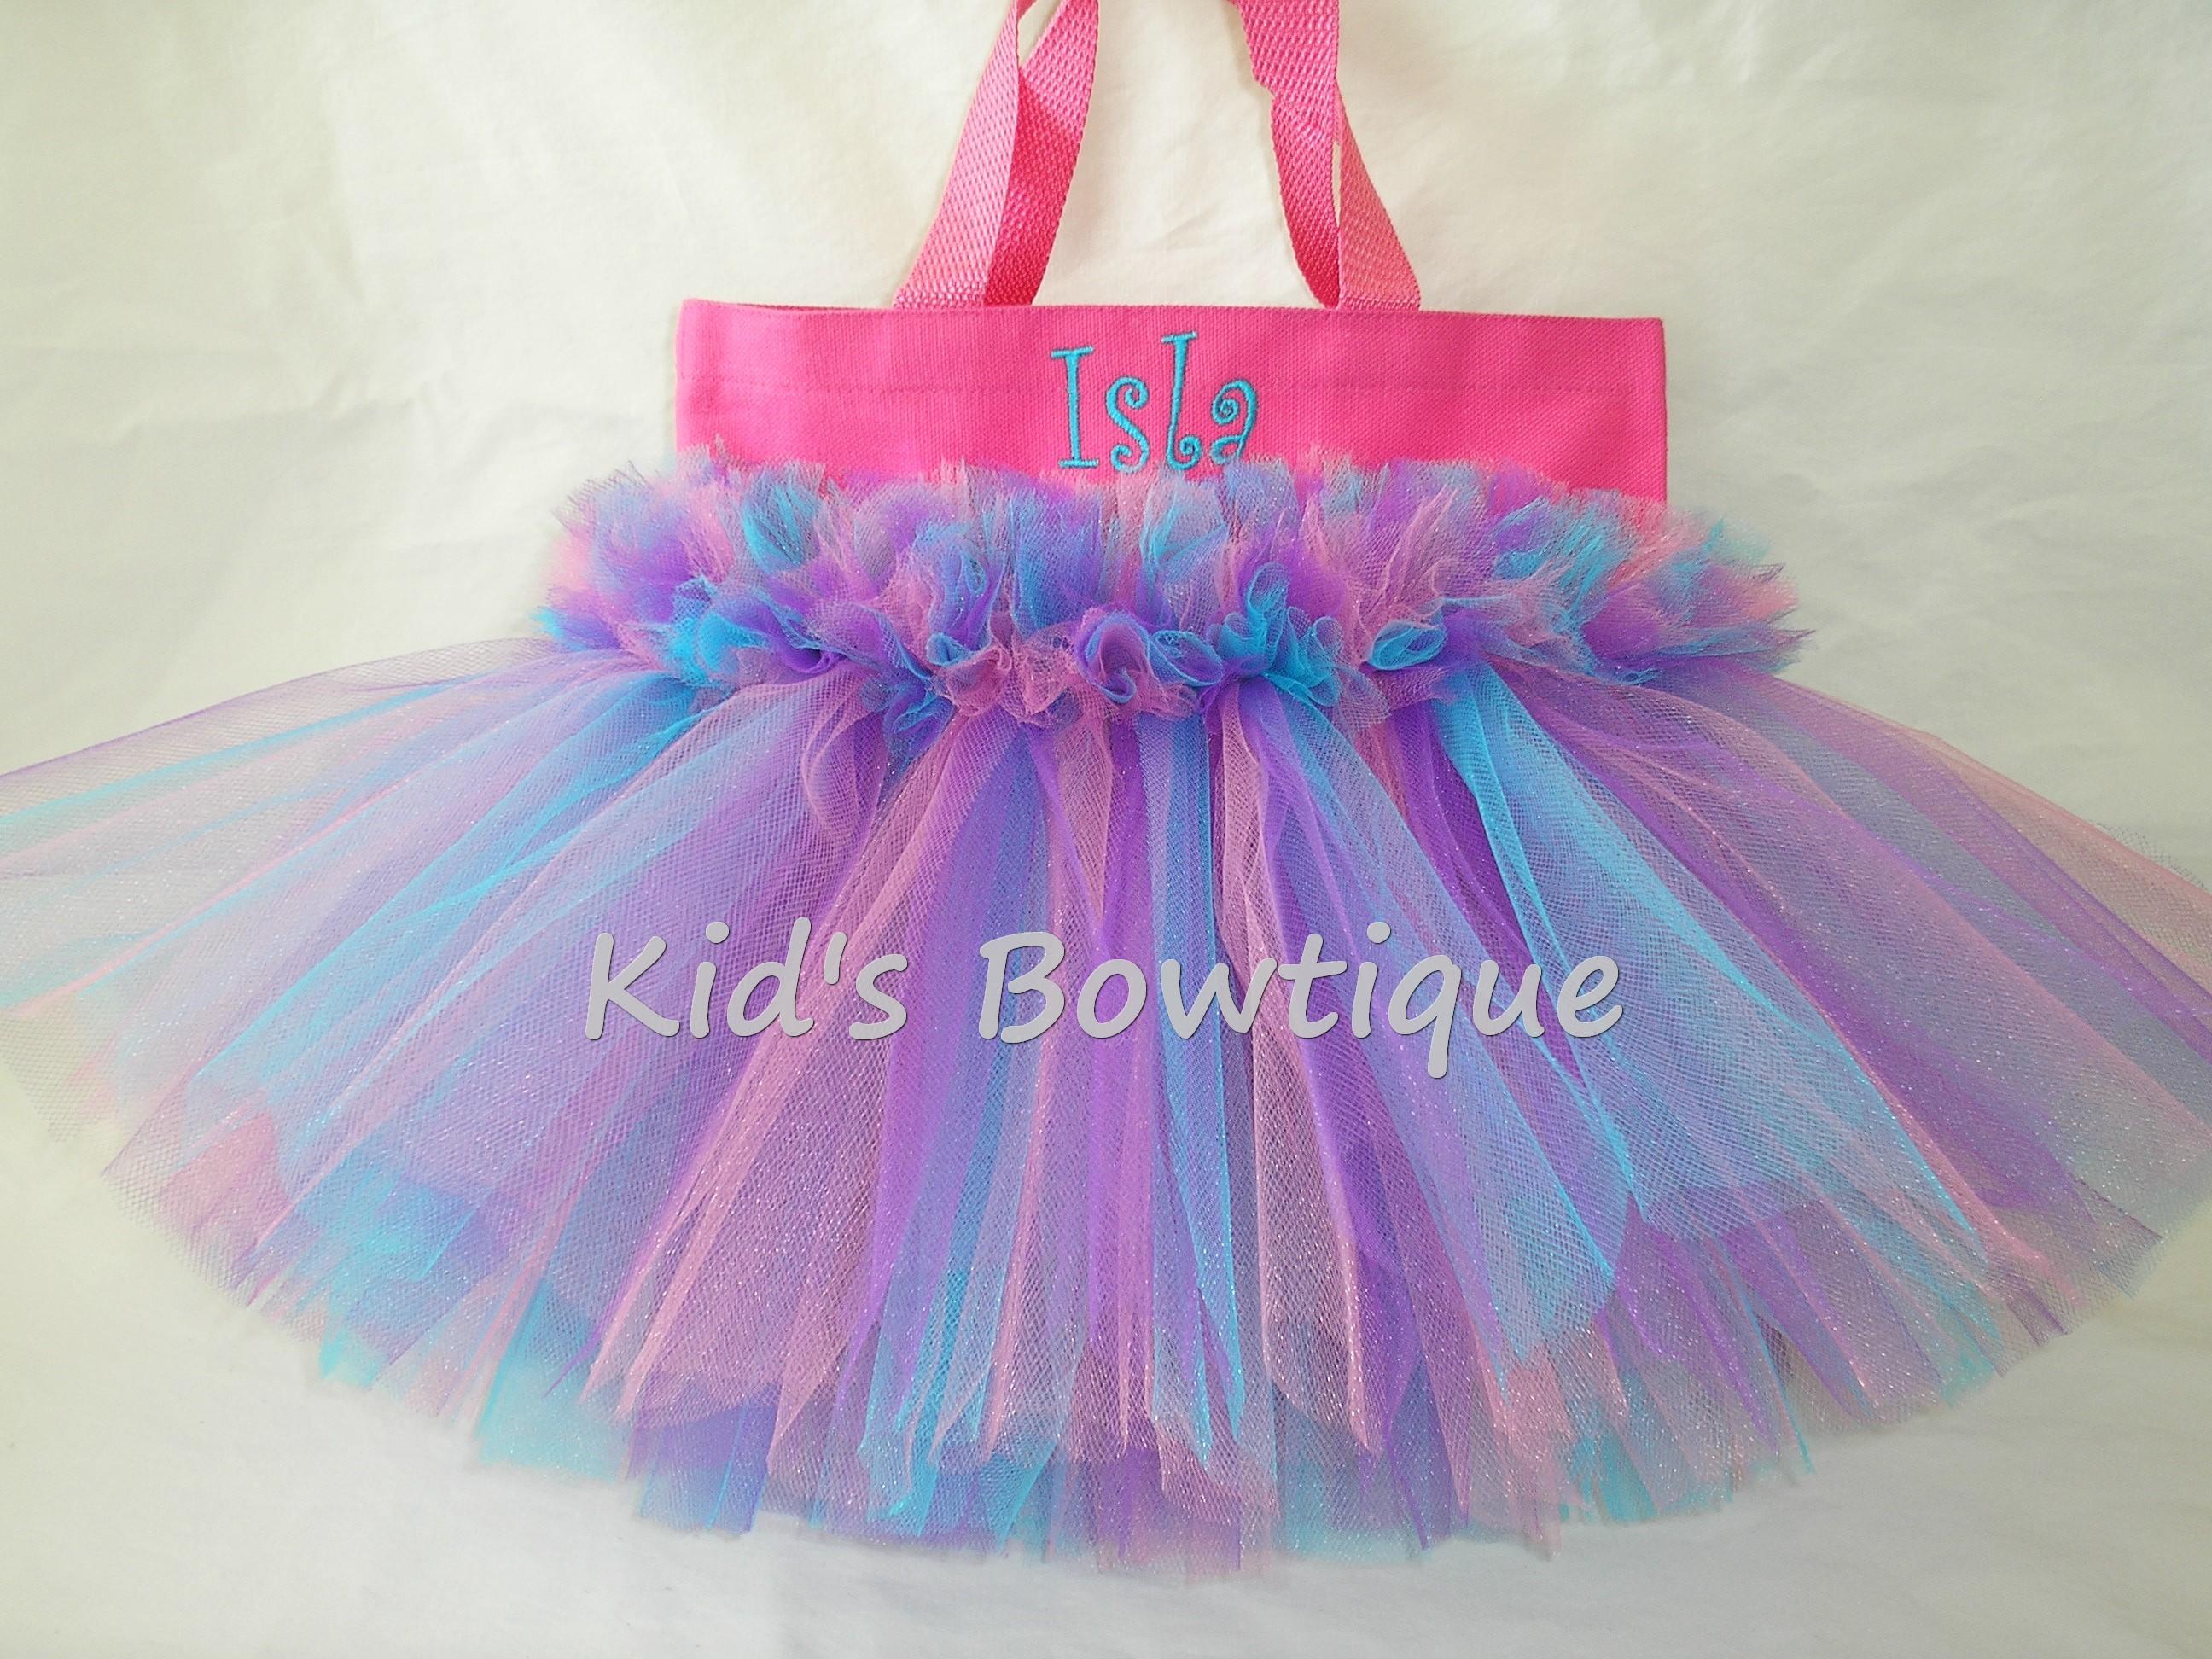 Monogrammed Tutu Tote Bag - ttb45 Aqua Pink Purple FLUFF